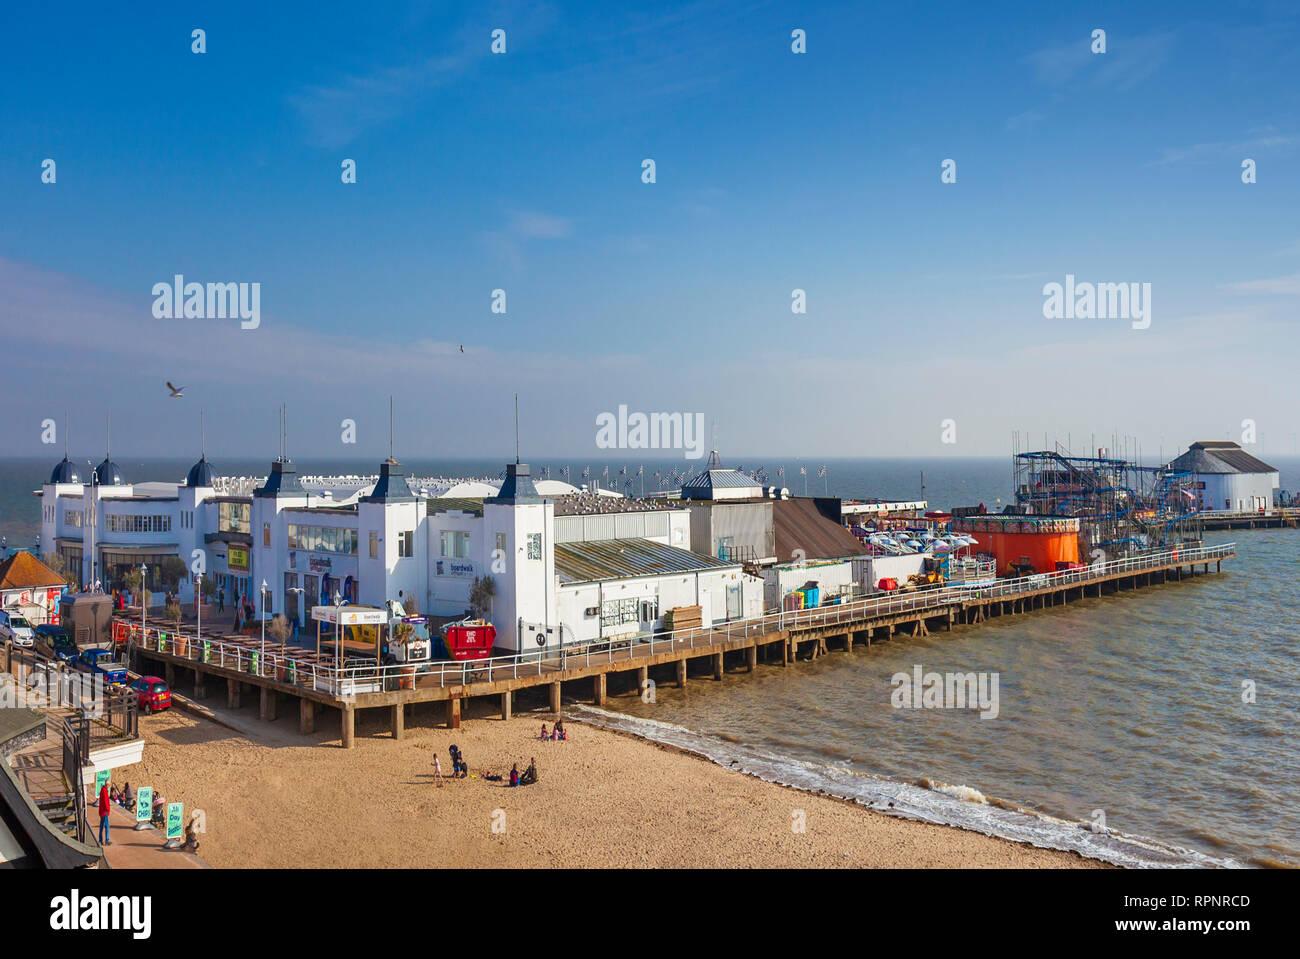 Clacton Pier - Stock Image